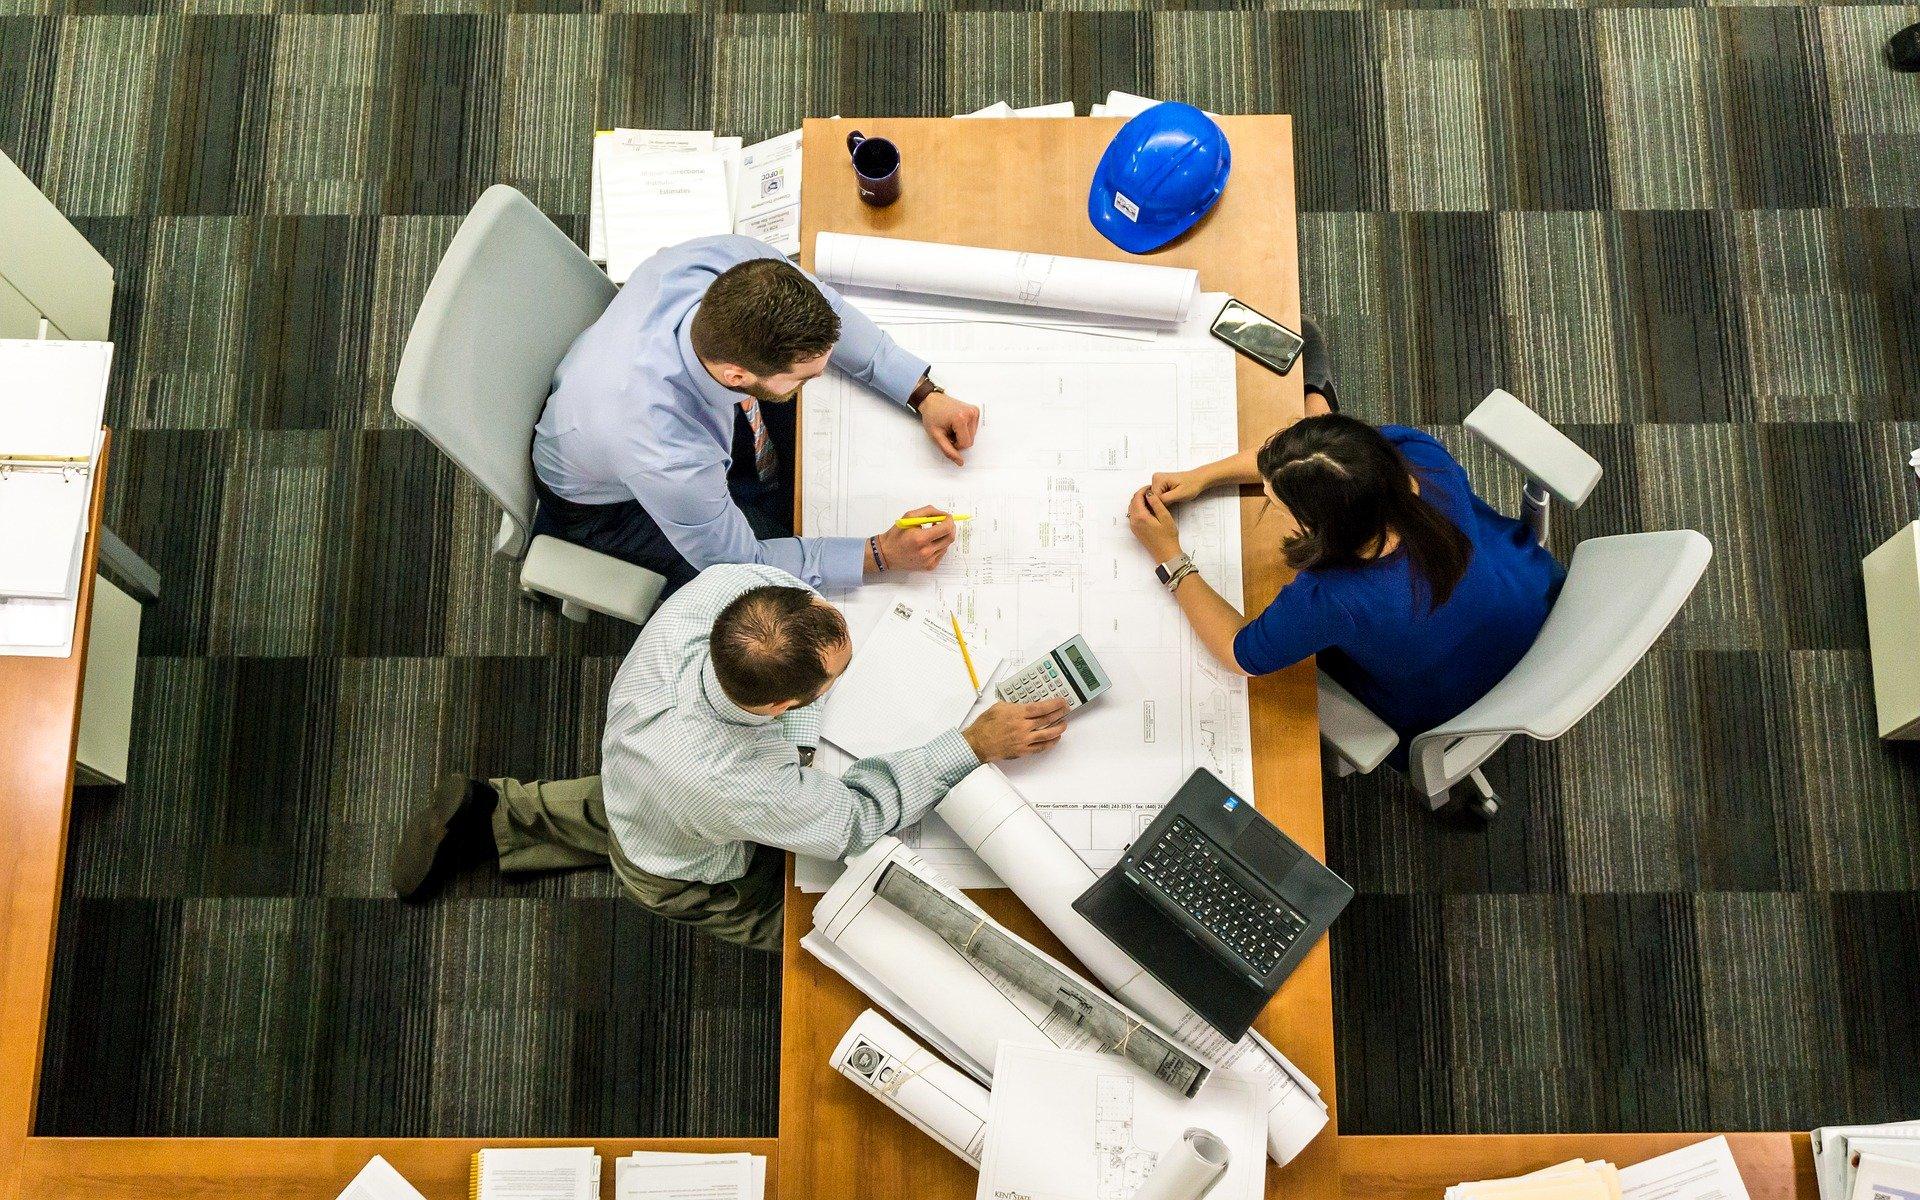 Siapkan Syarat Masuk Jurusan Arsitektur Mulai dari Sekarang